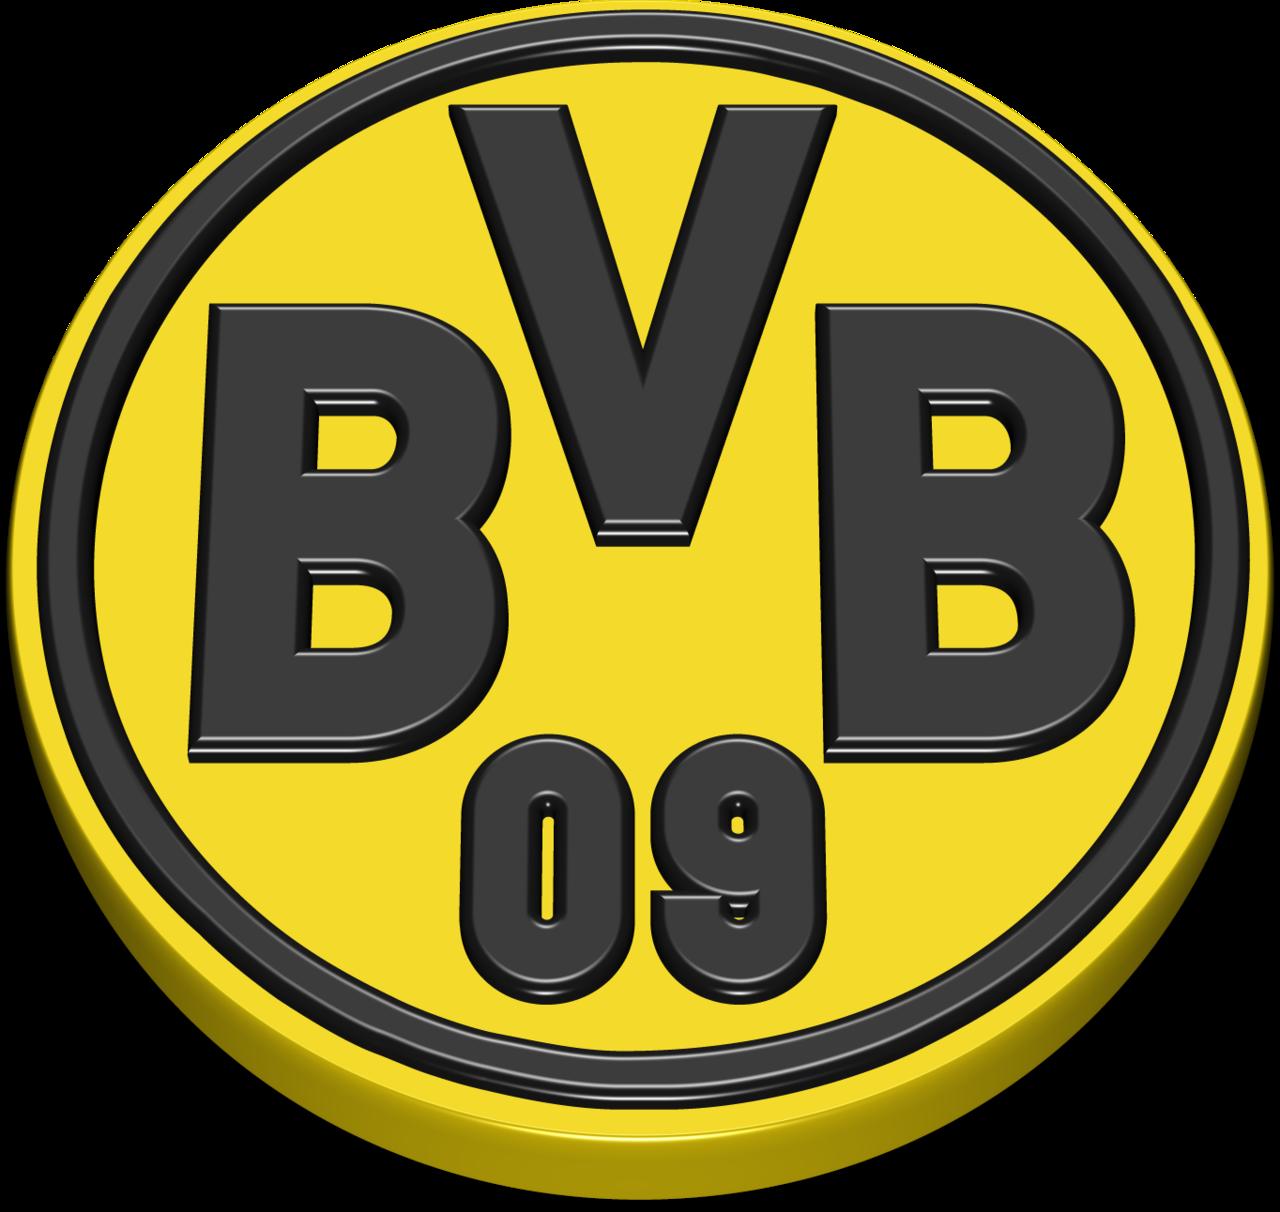 Borussia Dortmund Fc 3d Logo Png Images.